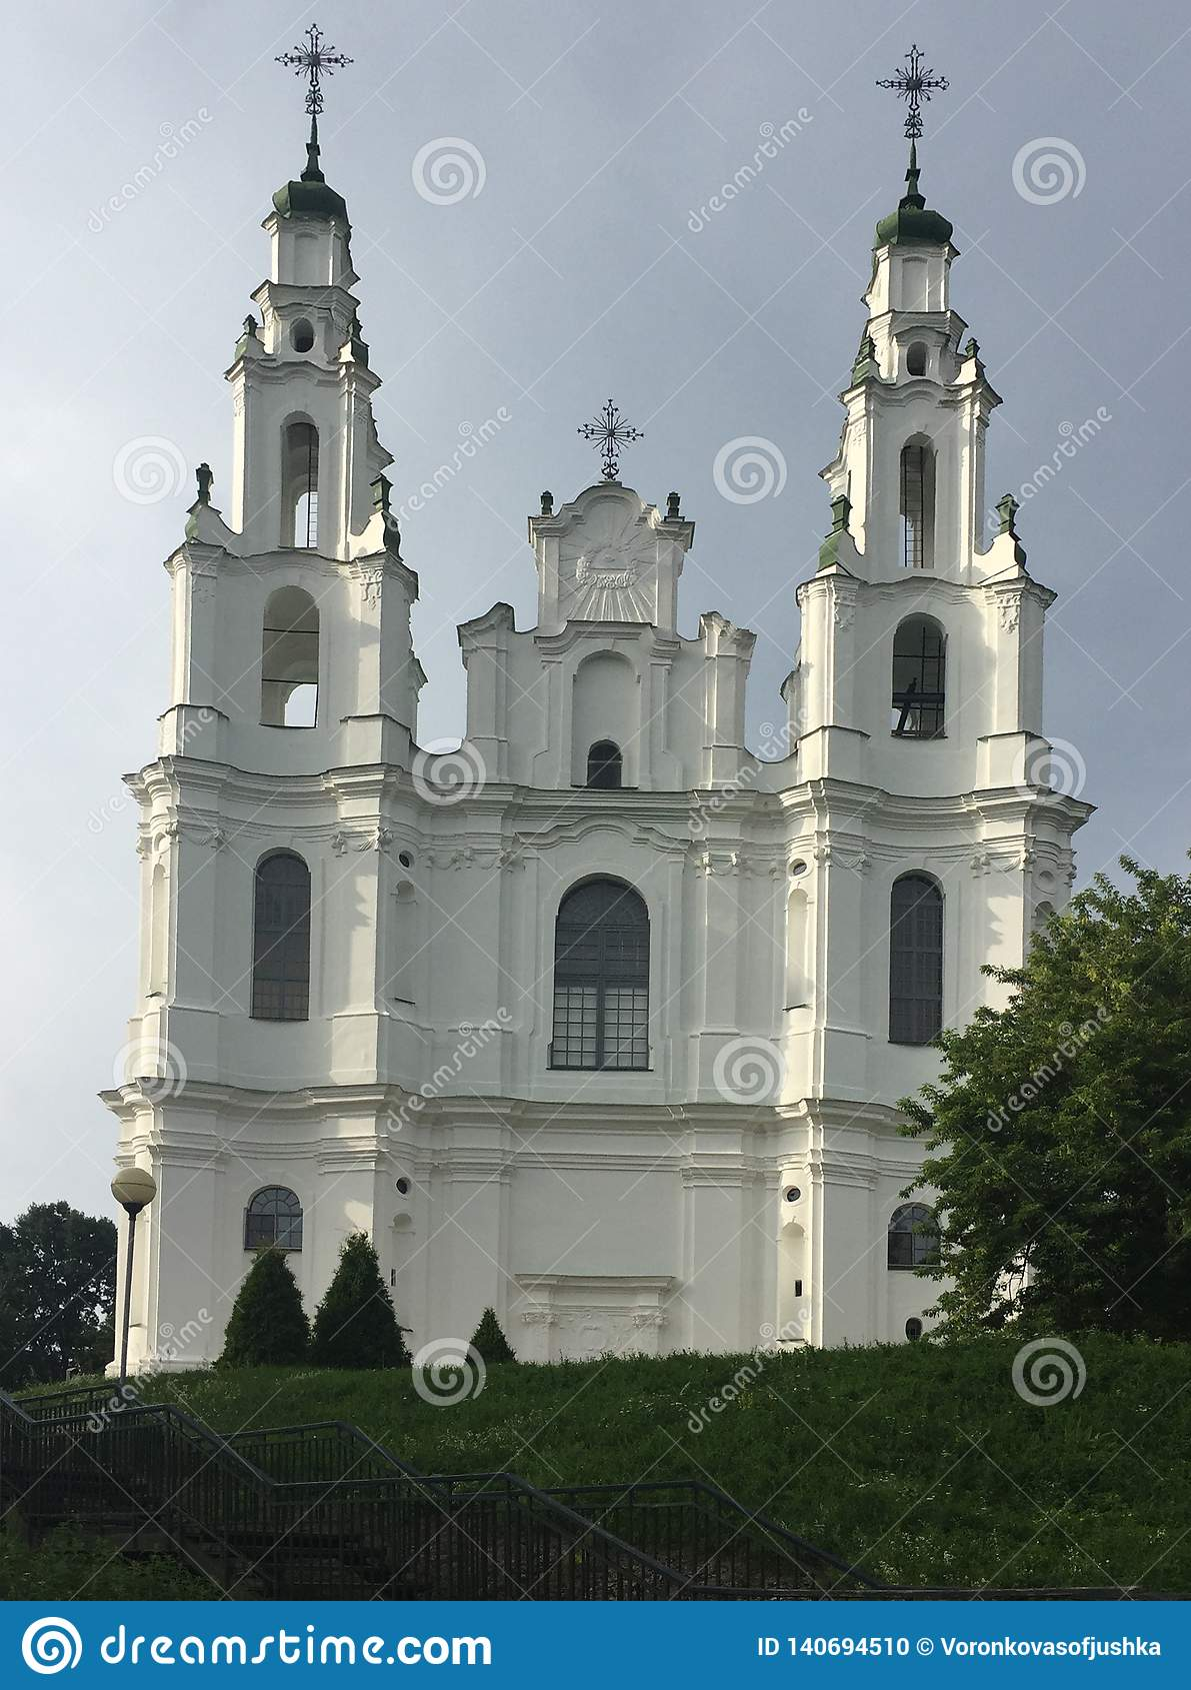 White Church in Polotsk Belarus